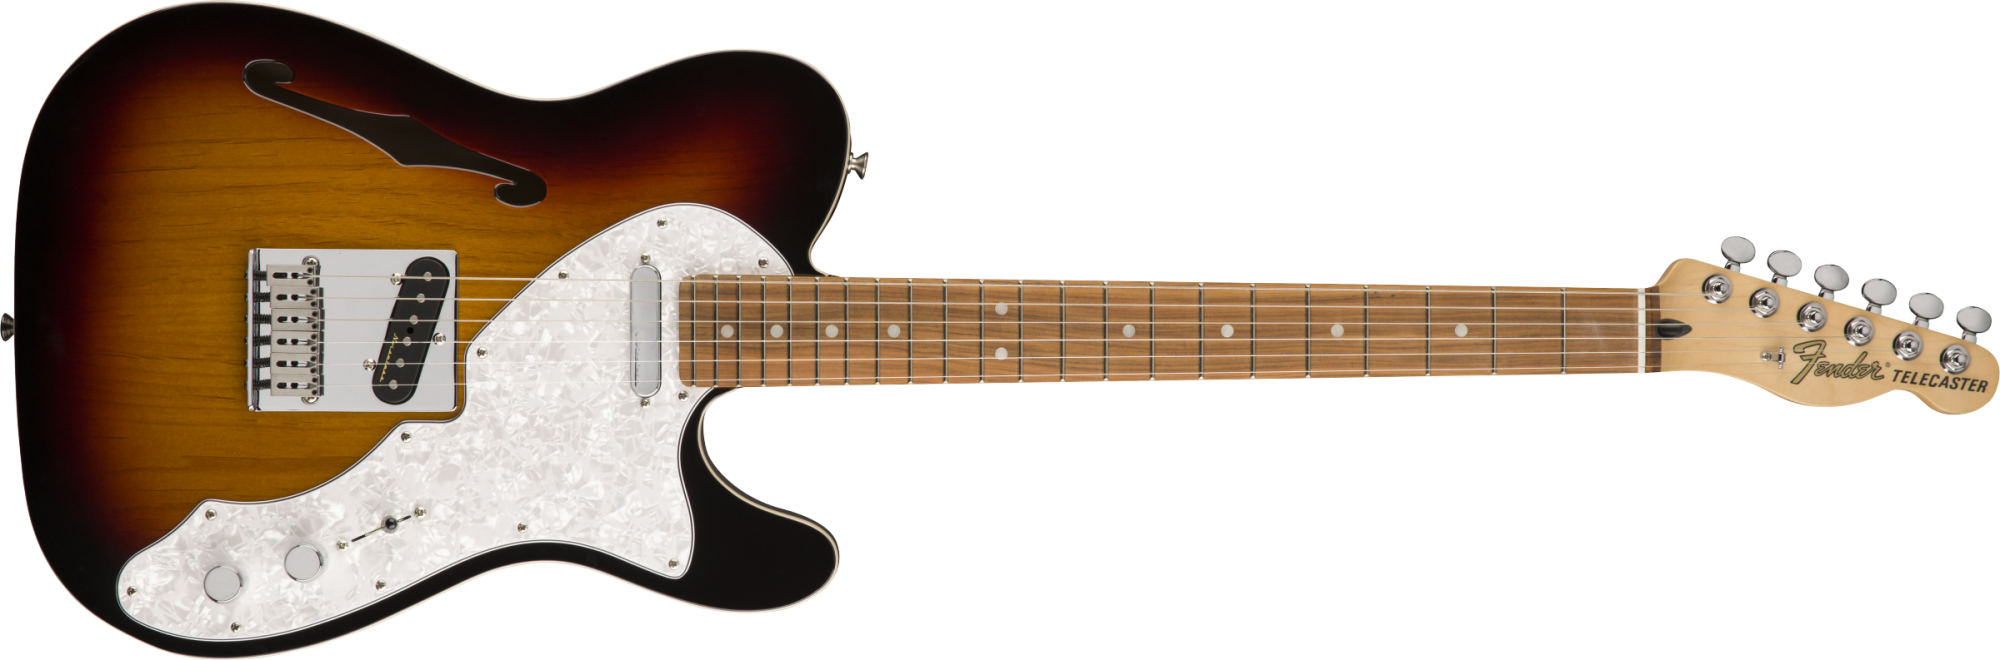 Fender Deluxe Telecaster Thinline 3-Color Sunburst Pau Ferro Fingerboard